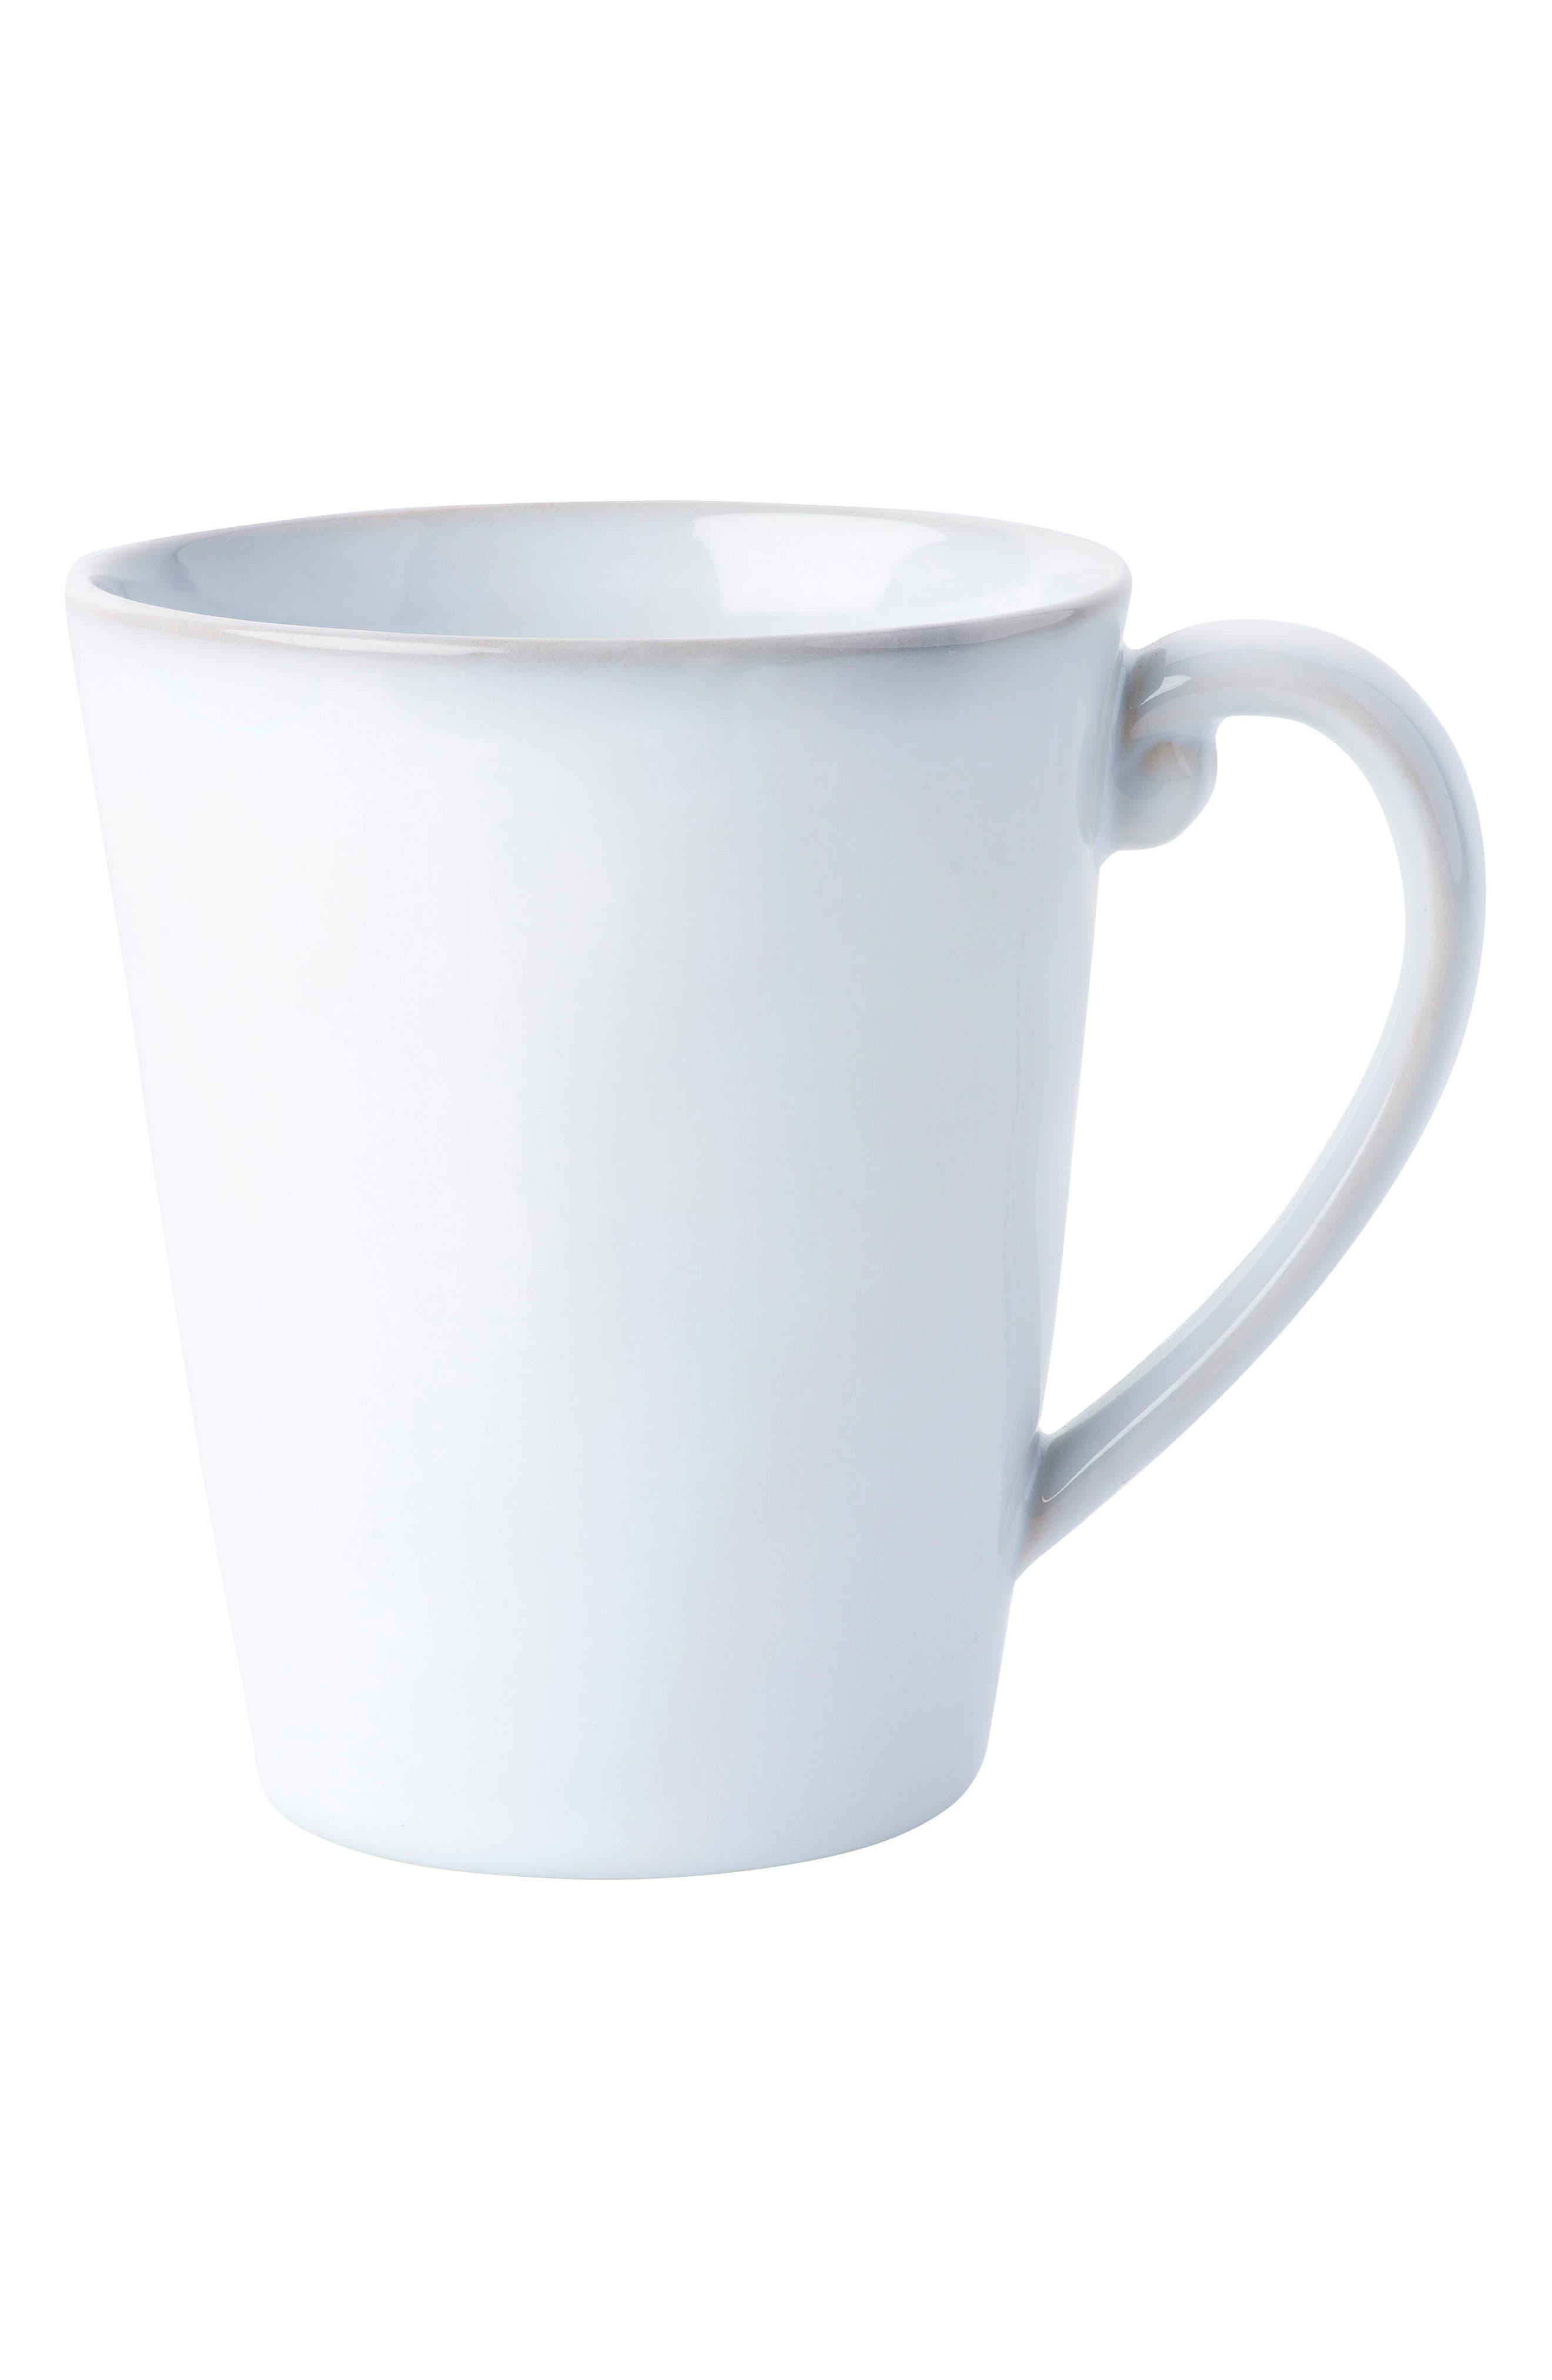 Main Image - Juliska Quotidien White Truffle Ceramic Mug